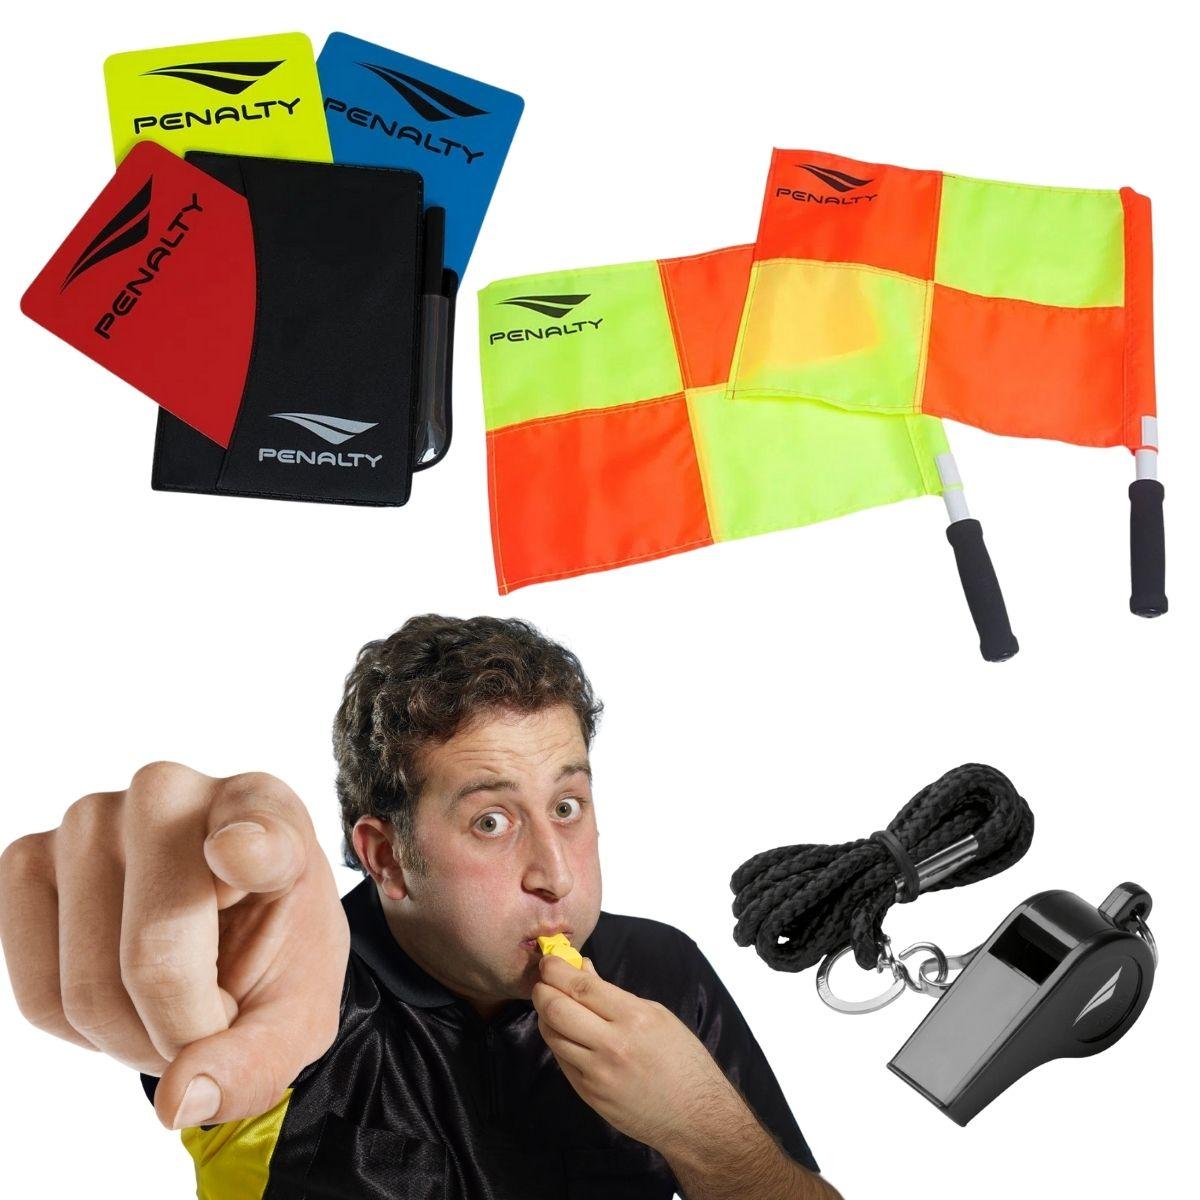 Kit Árbitro Com Apito Cartão E Bandeira Penalty Pro